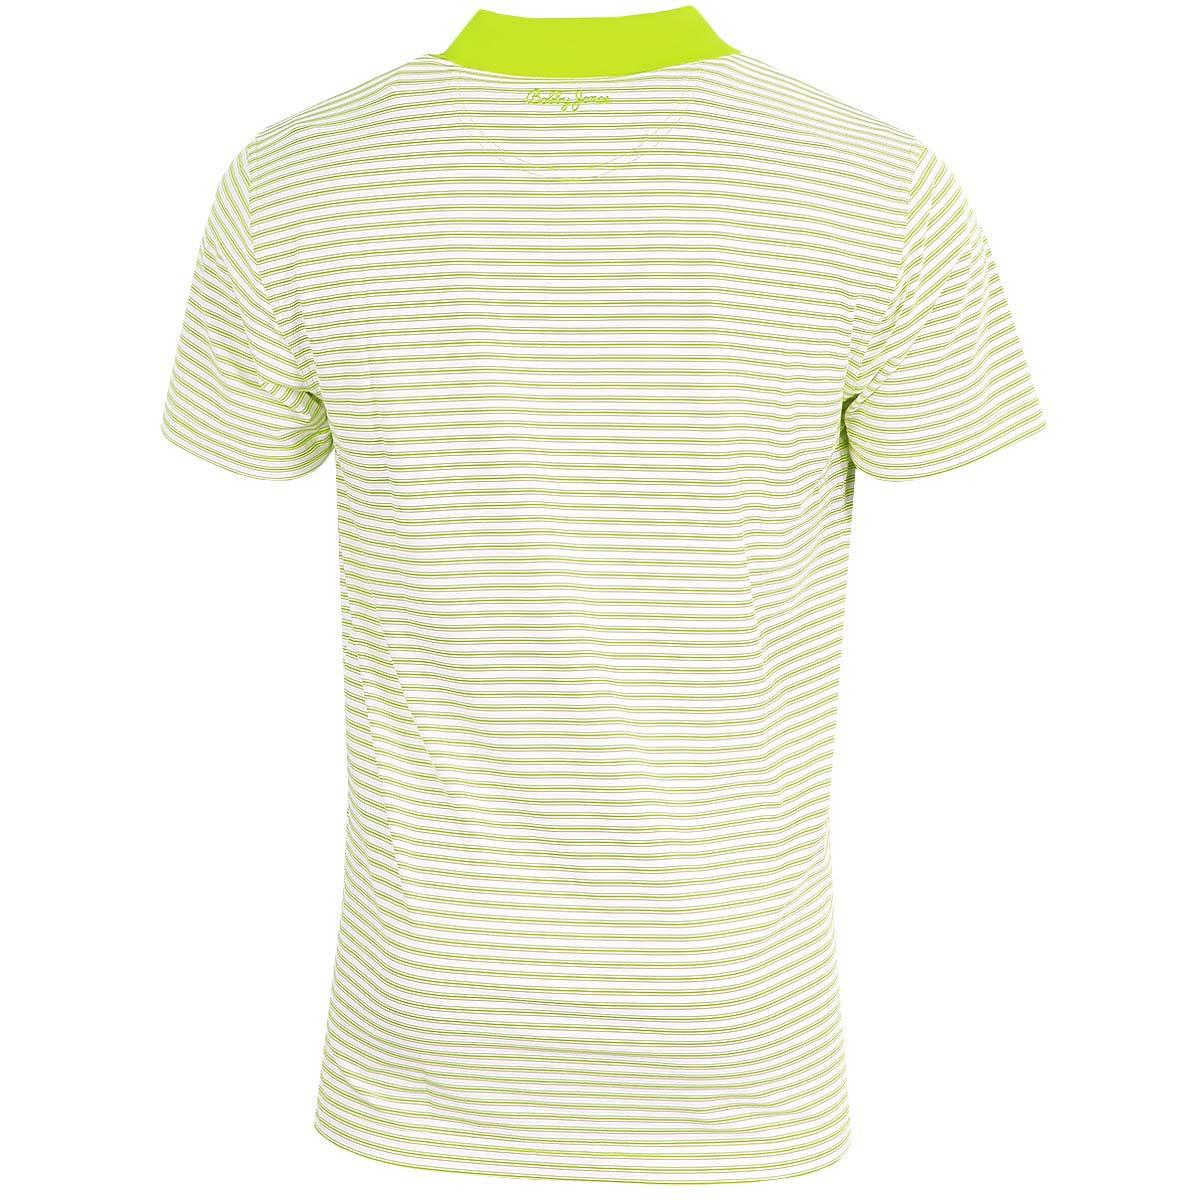 Bobby-Jones-Mens-XH20-Frame-Stripe-European-Fit-Golf-Polo-Shirt-72-OFF-RRP thumbnail 13